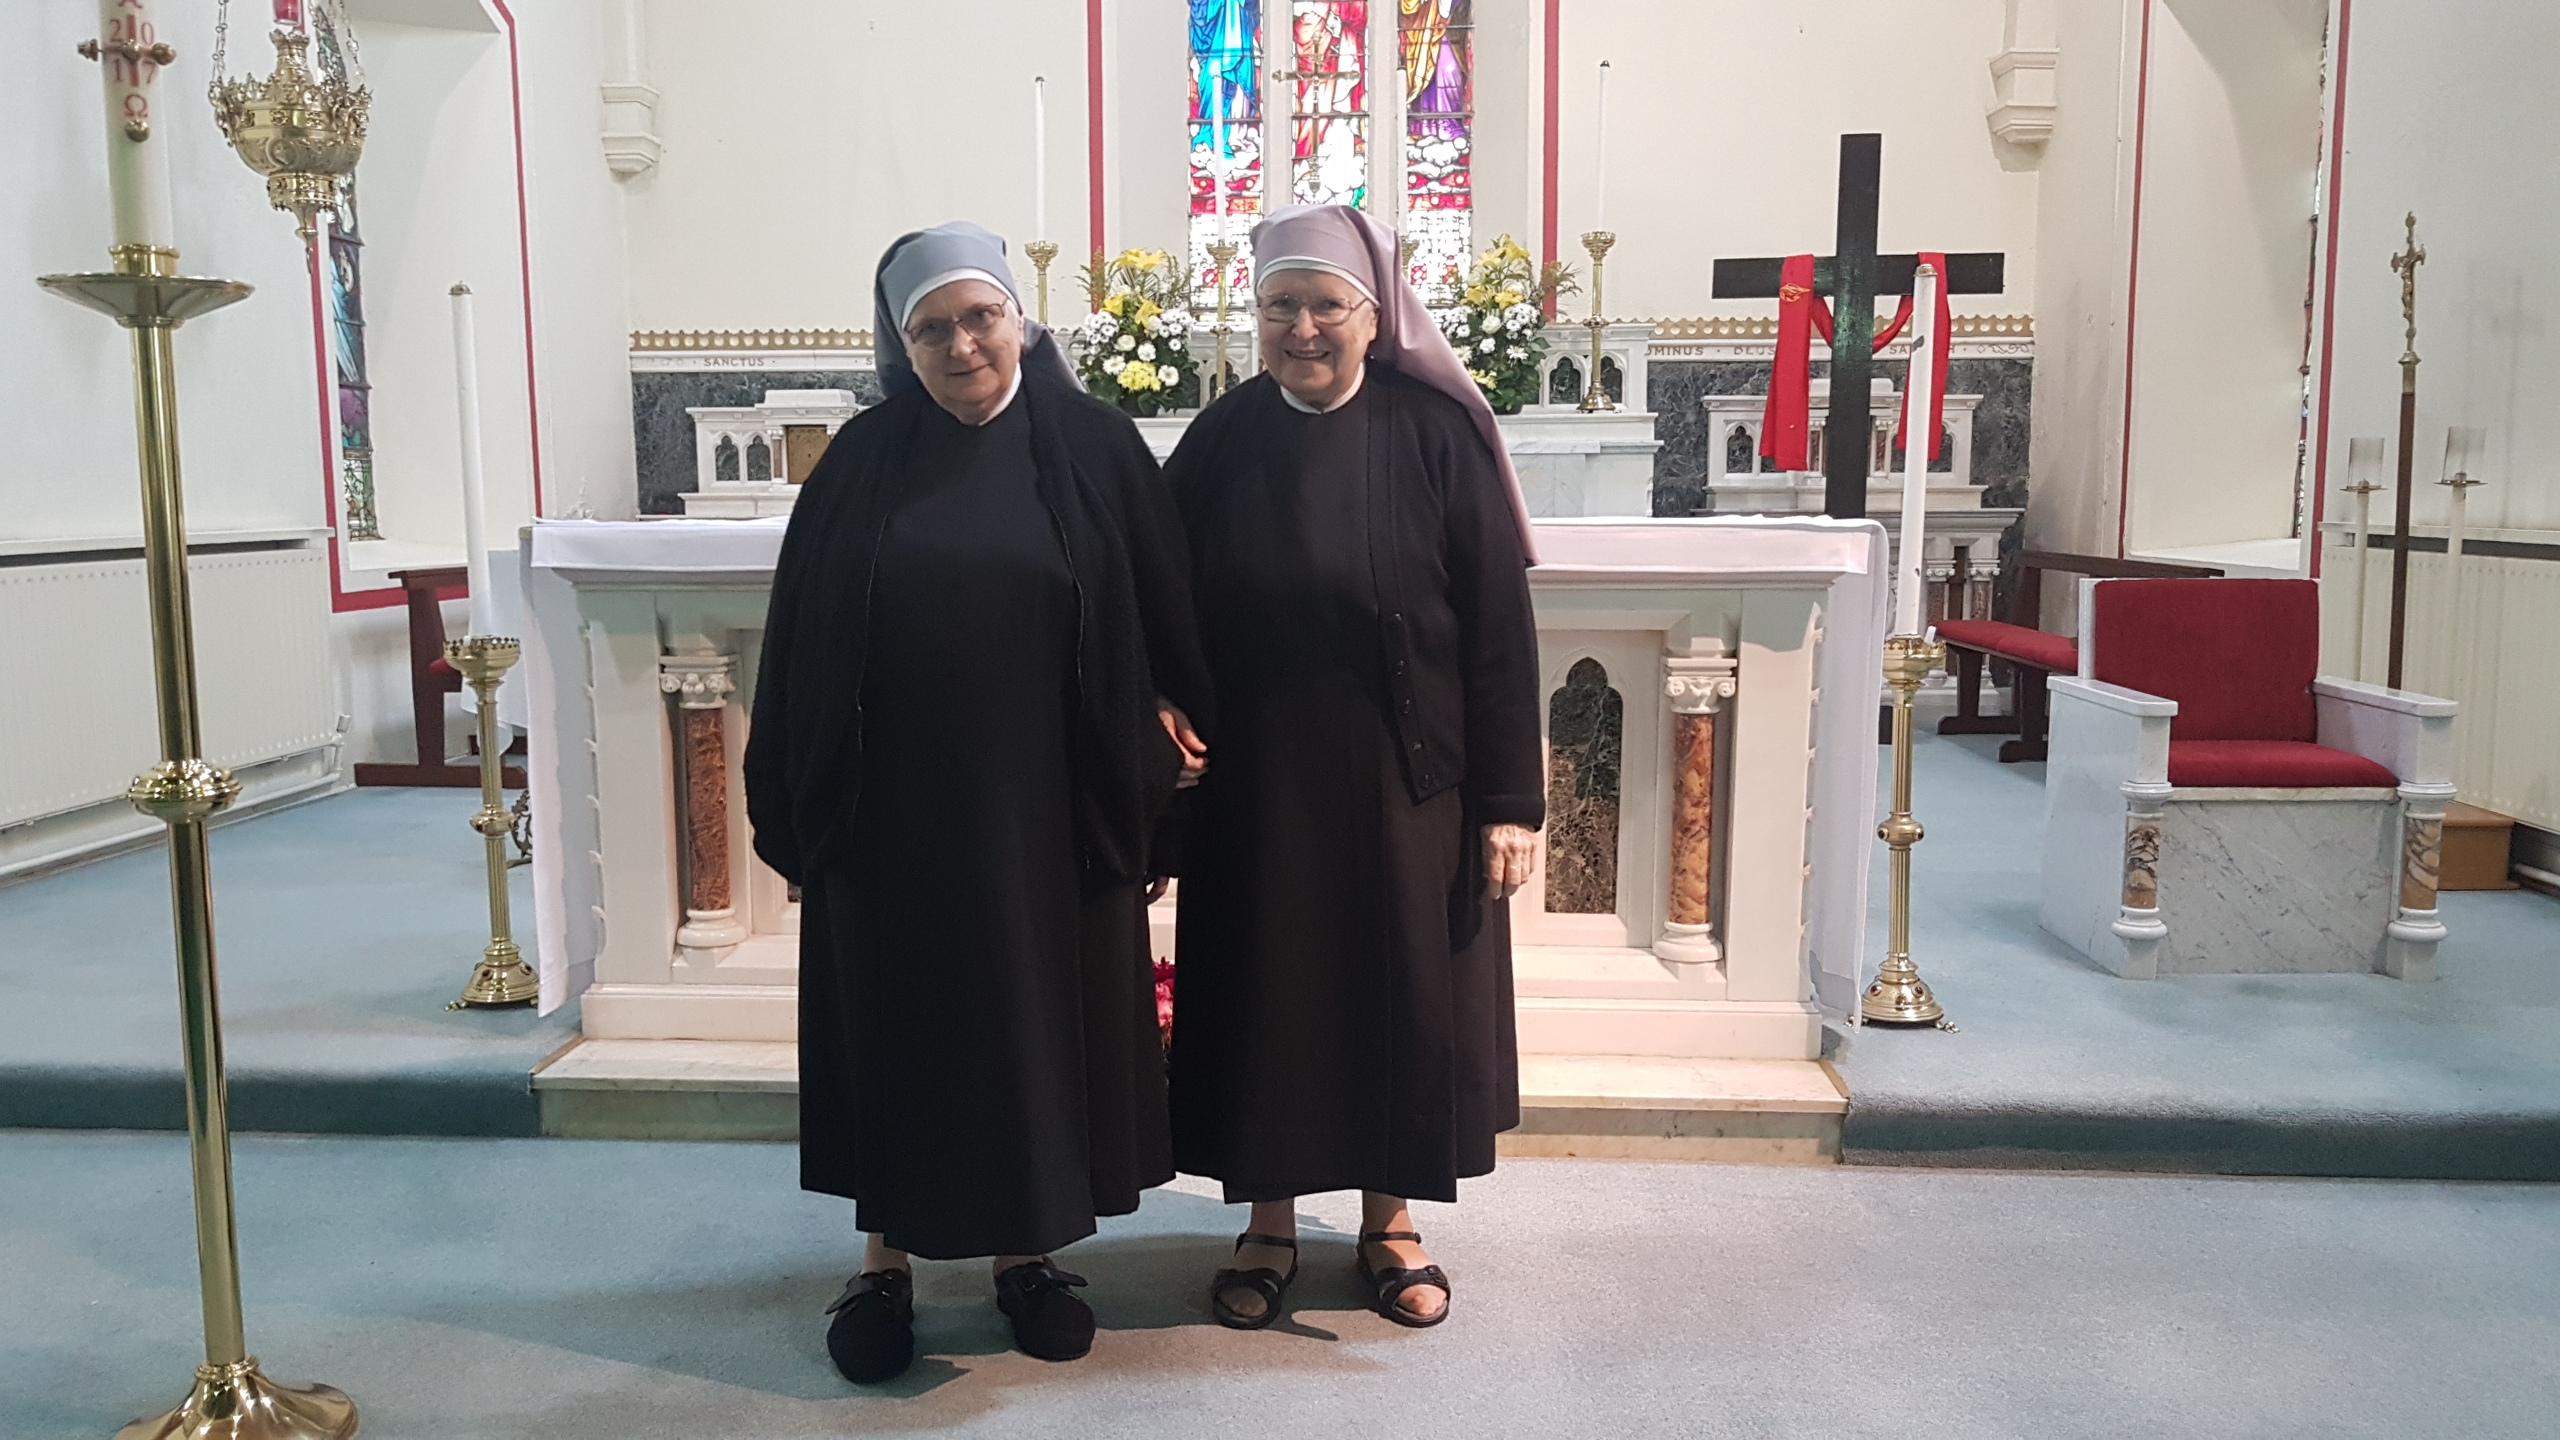 Sisters Visit Home